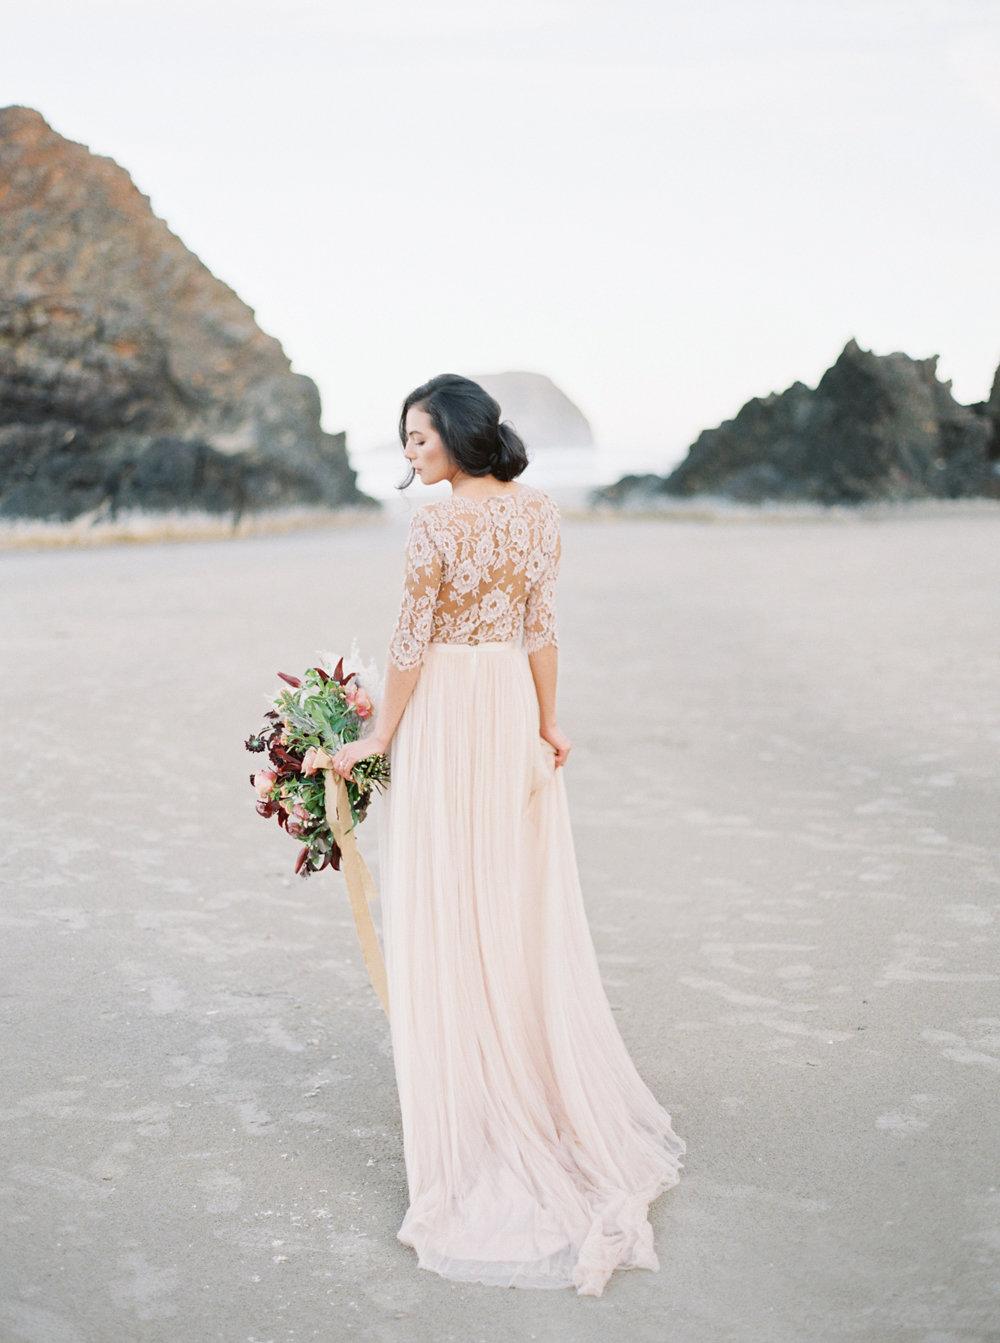 Oregon Coast Wedding | Oregon Wedding | Oregon Wedding Planner | Workshop Design | Workshop Designer | Katie Nicolle Photography | Stacey Foley Design